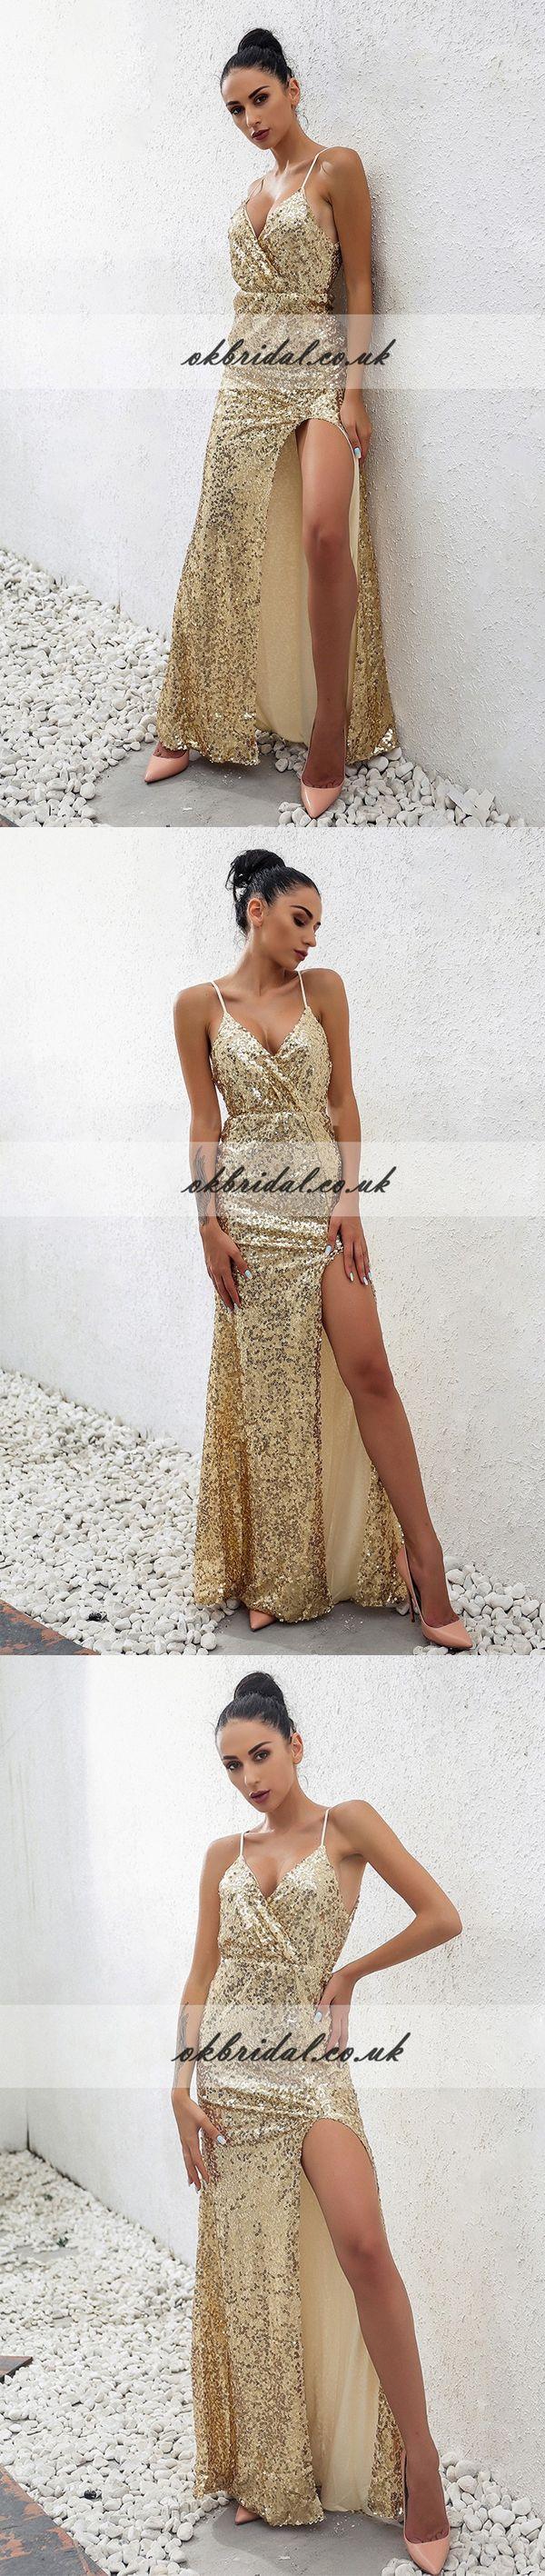 Spaghetti Straps Sequin Prom Dress, Sexy V-Neck Side Split Prom Dress, KX253 #okbridal #promdress